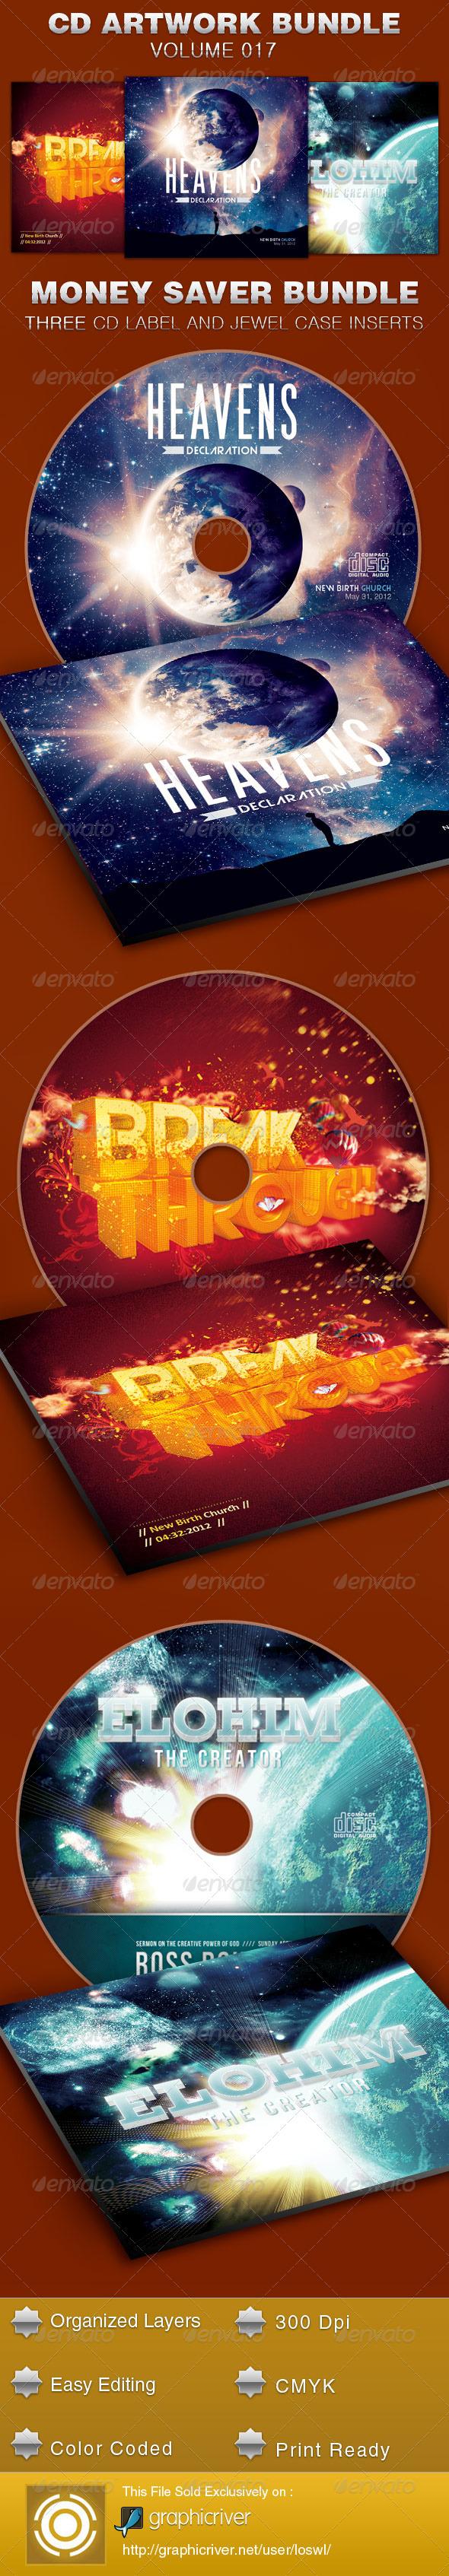 CD Cover Artwork Template Bundle-Vol 017 - CD & DVD Artwork Print Templates